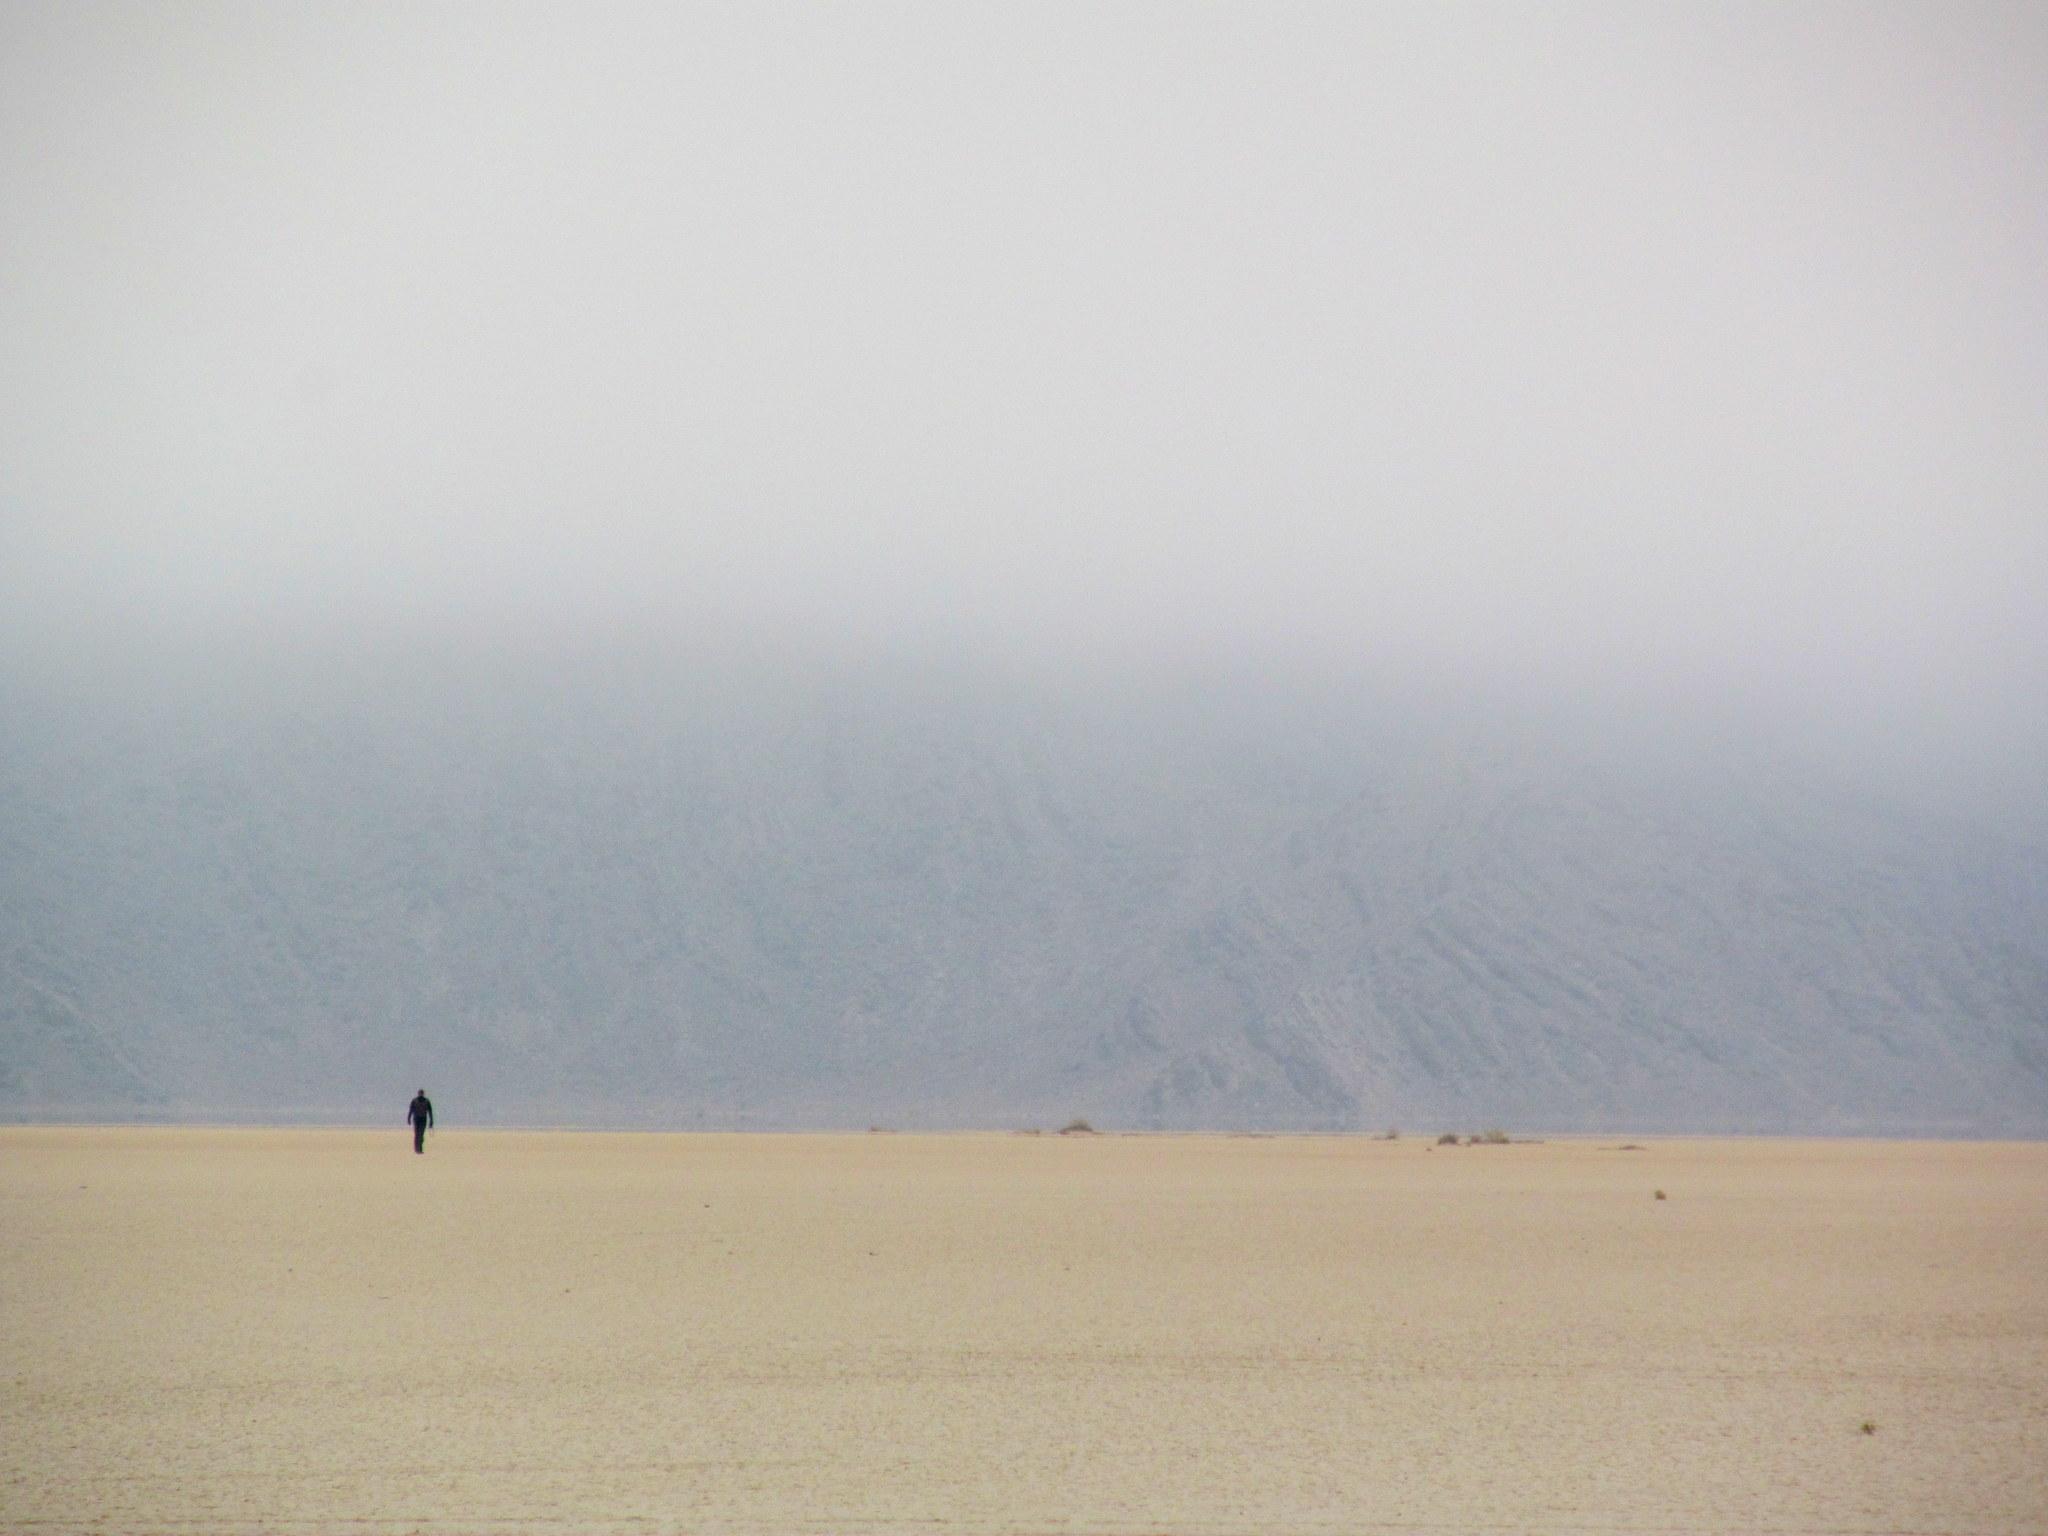 Photo: Chris on the playa